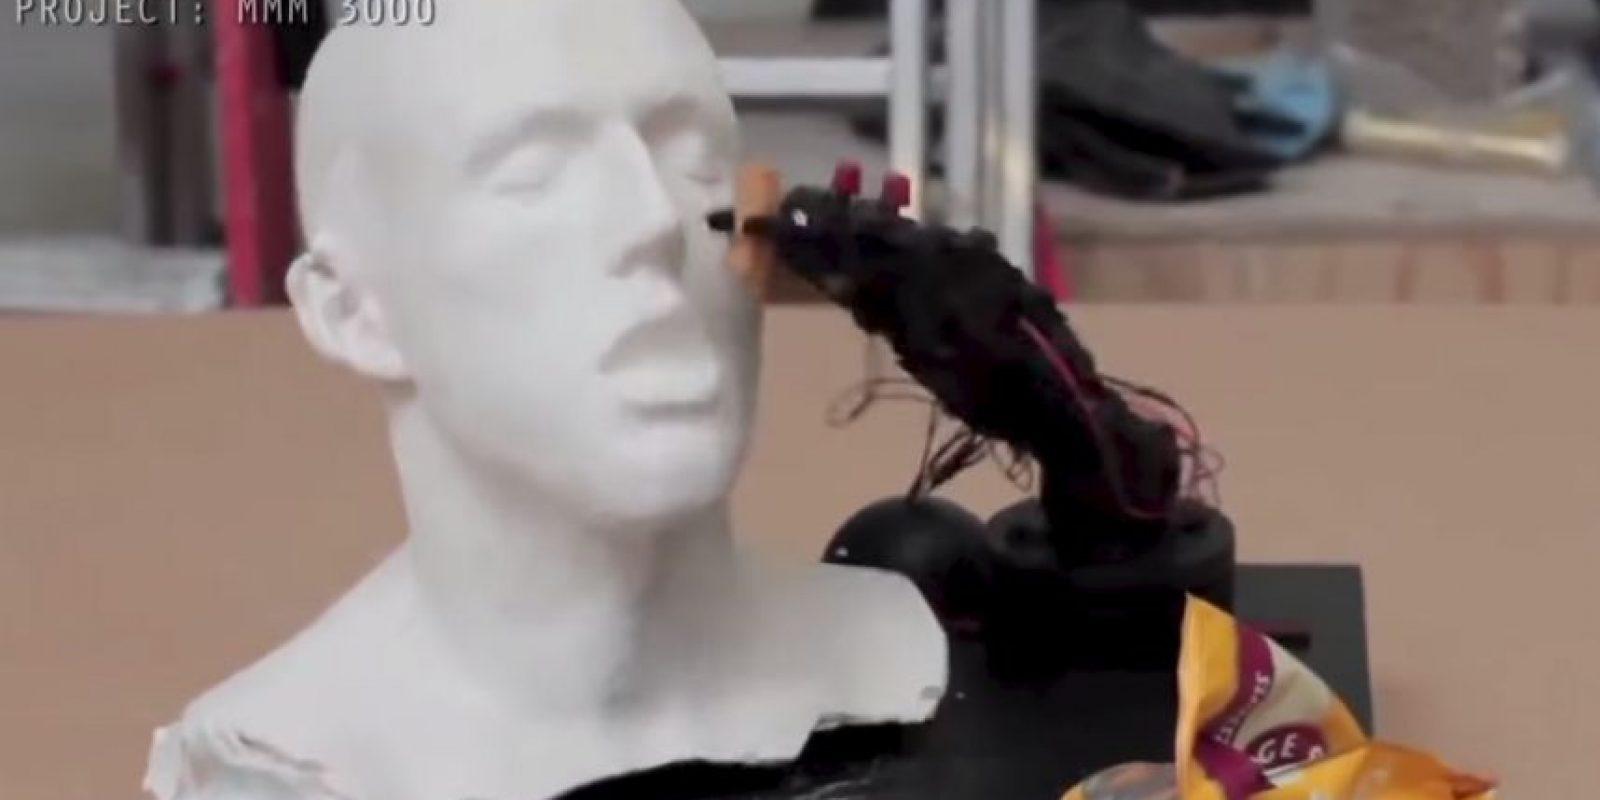 Este brazo robótico no atina a la boca del modelo Foto:Youtube/Master Haku